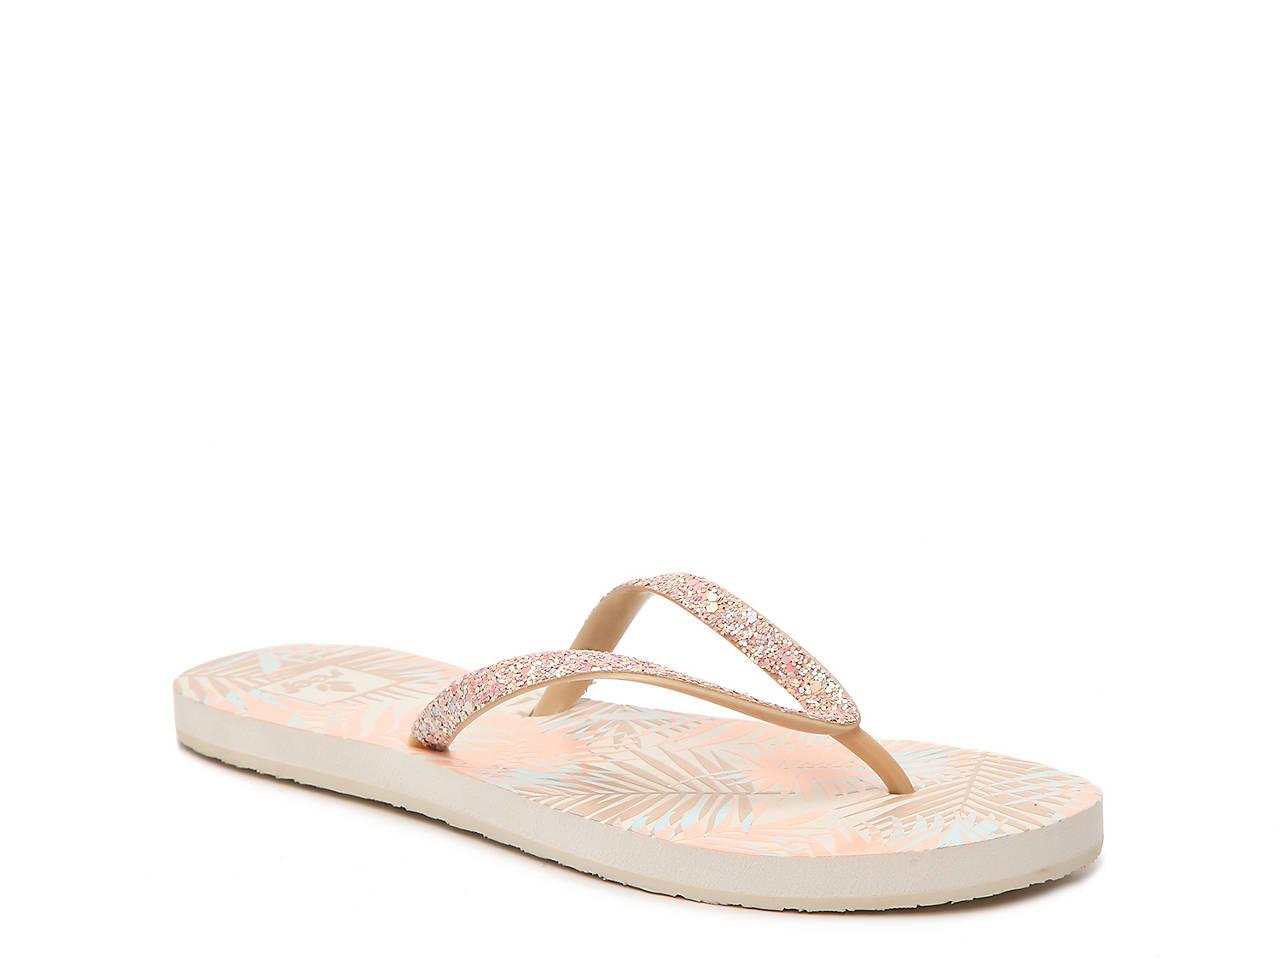 f5b8d962d10 Reef Stargazer Flip Flop Women s Shoes